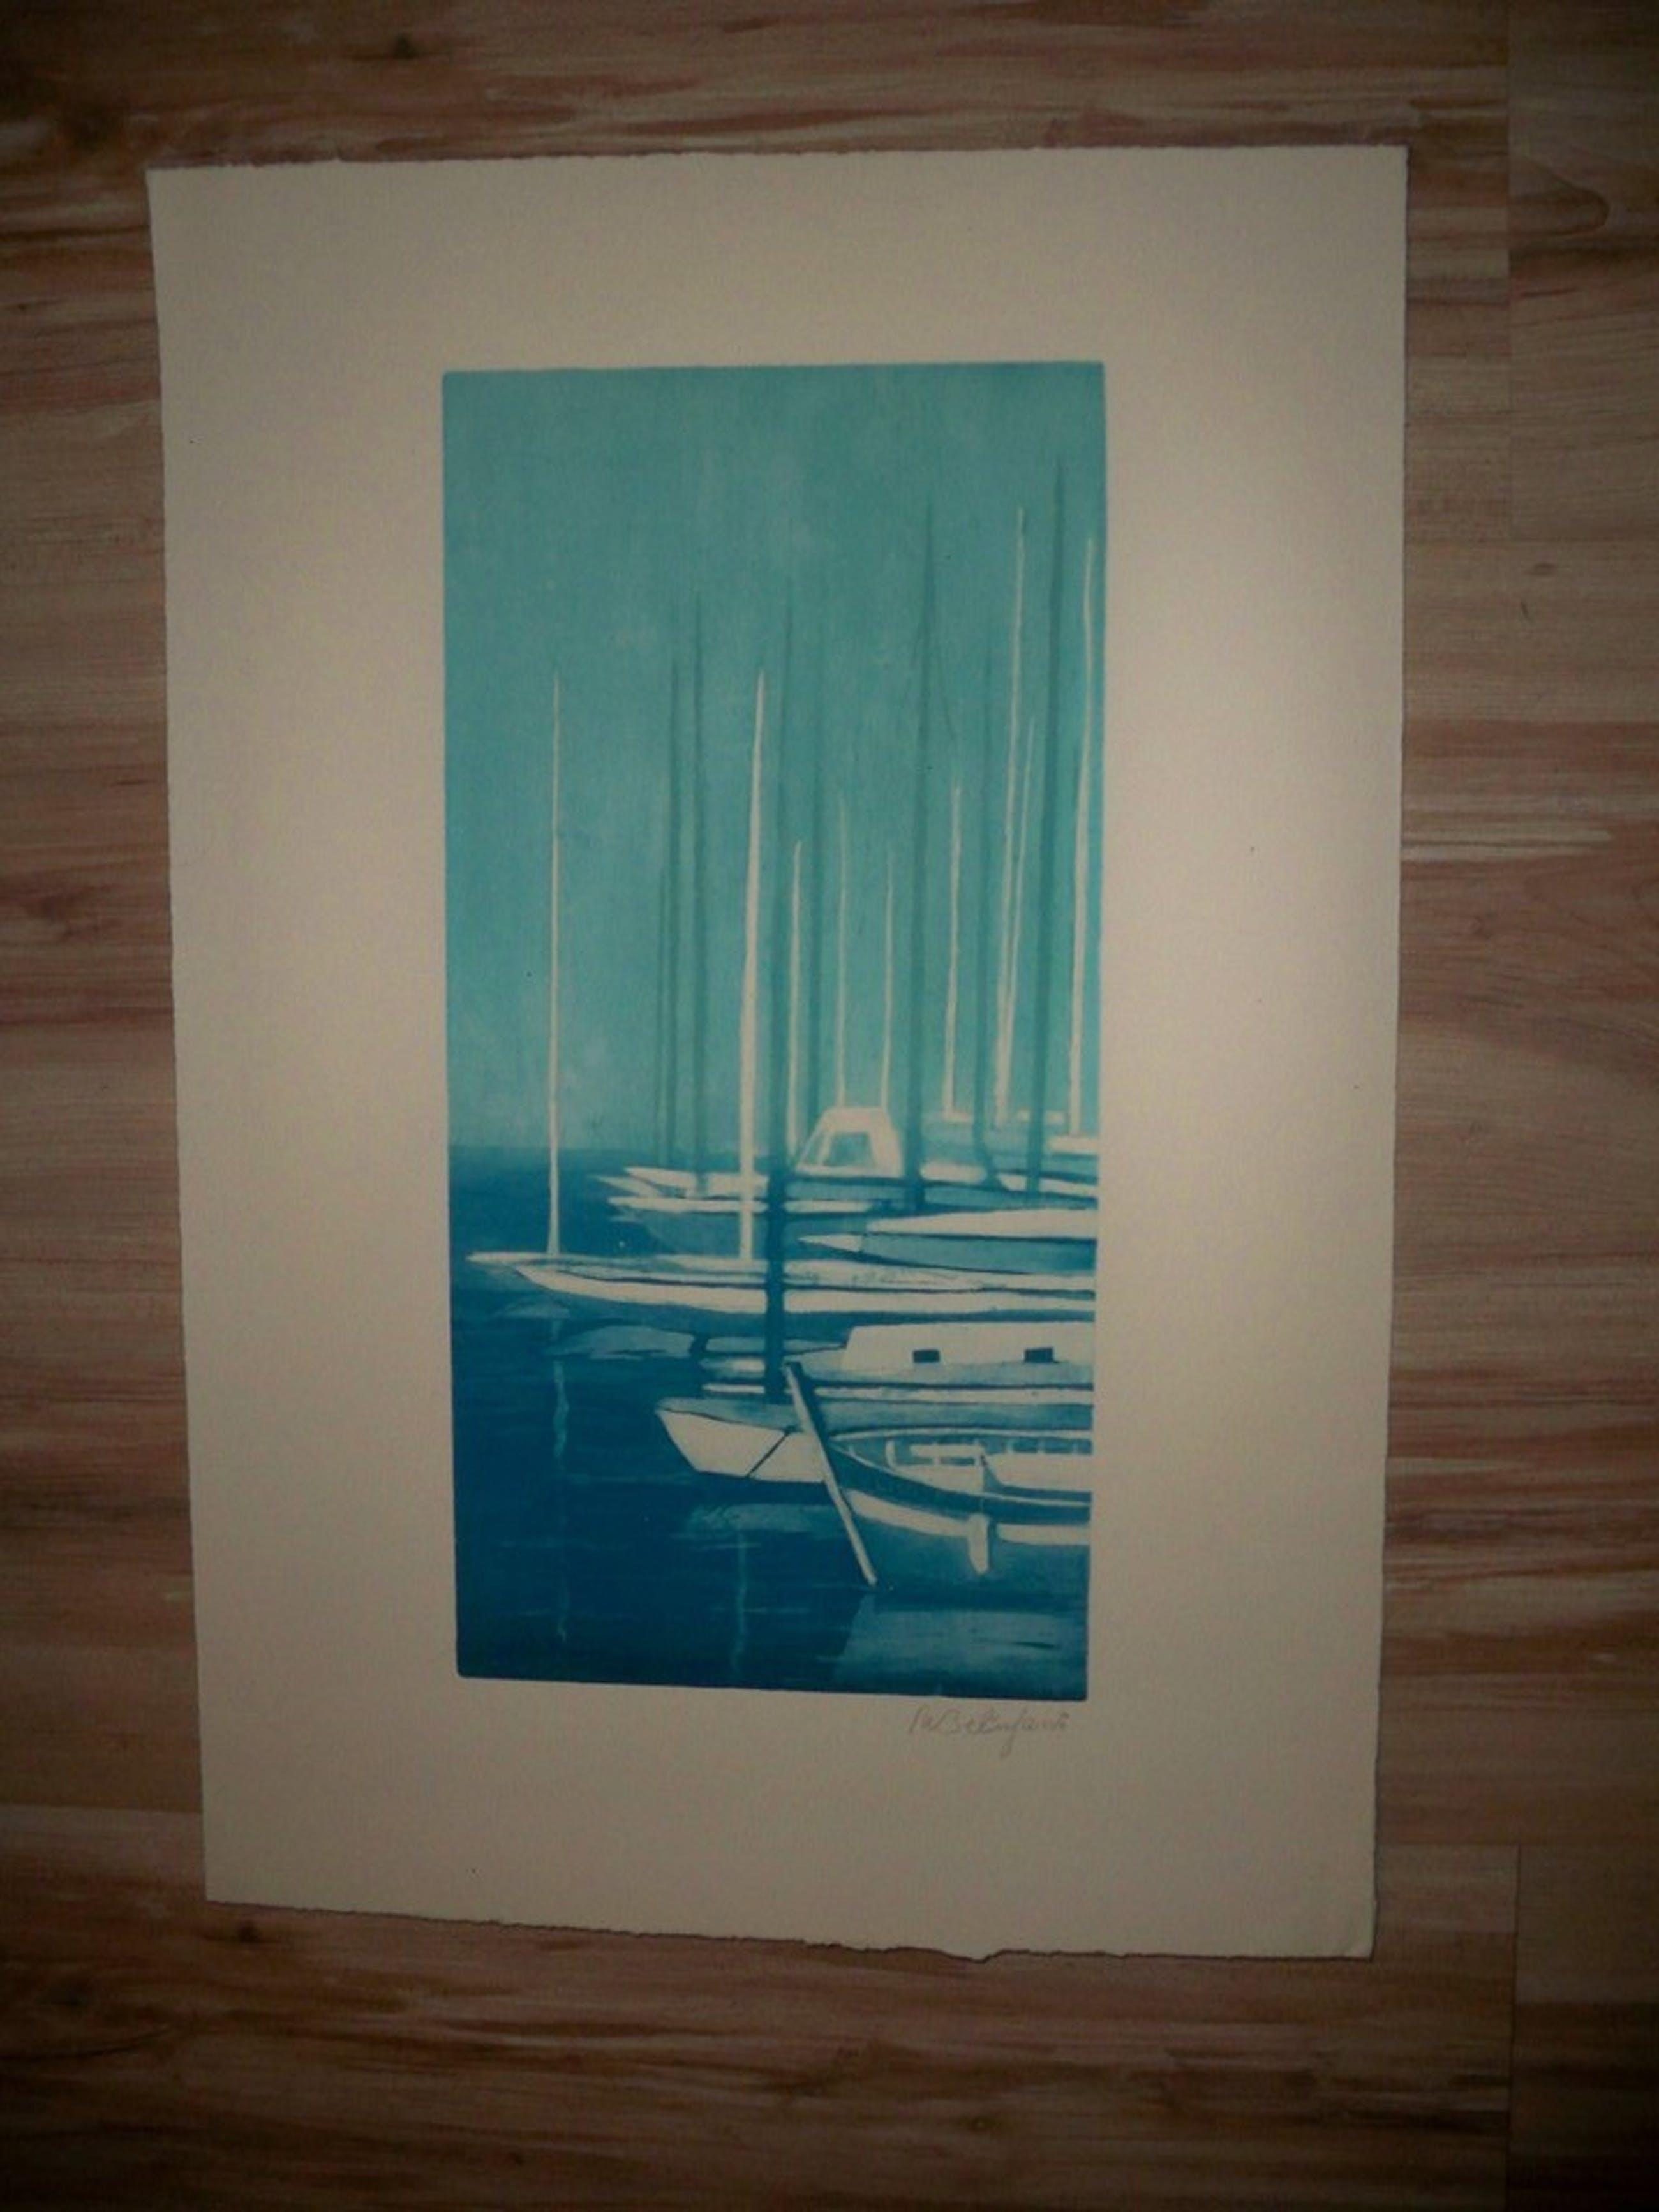 Willy Belinfante - Blue Marine / Montagne - Kleurenets kopen? Bied vanaf 35!